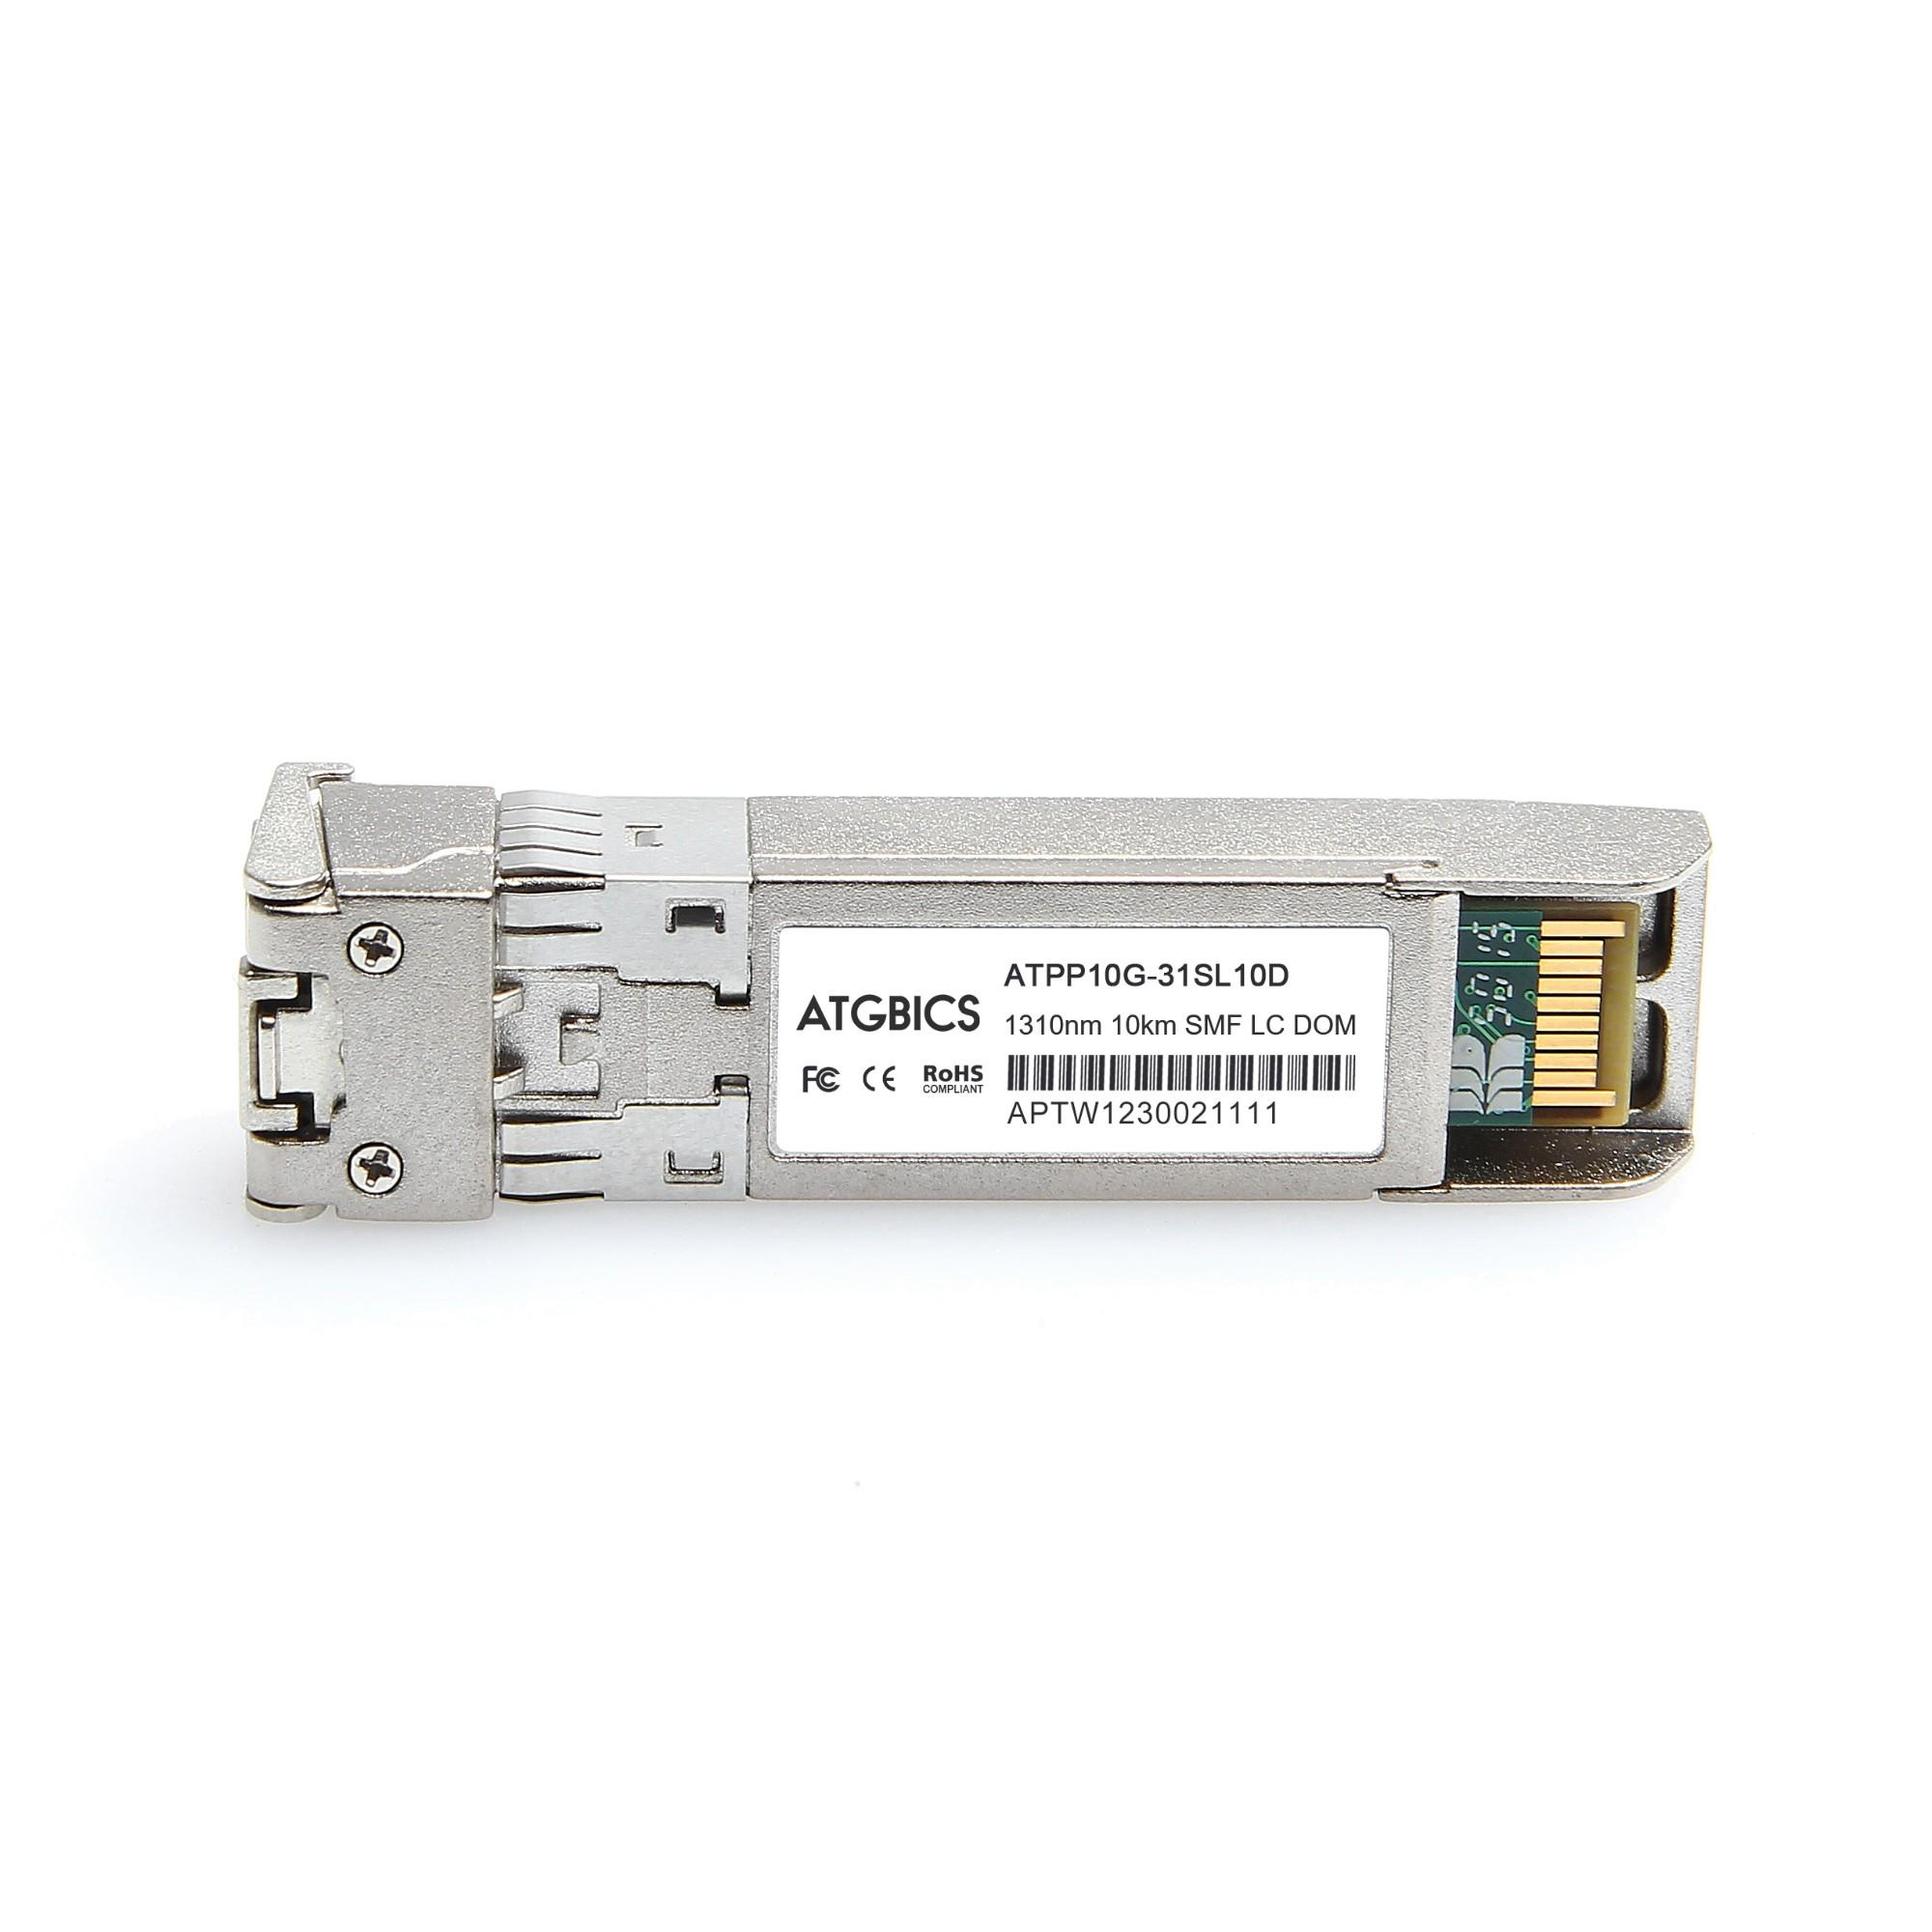 Image of ATGBICS XBR-000182-C network transceiver module Fiber optic 10000 Mbit/s SFP+ 1310 nm